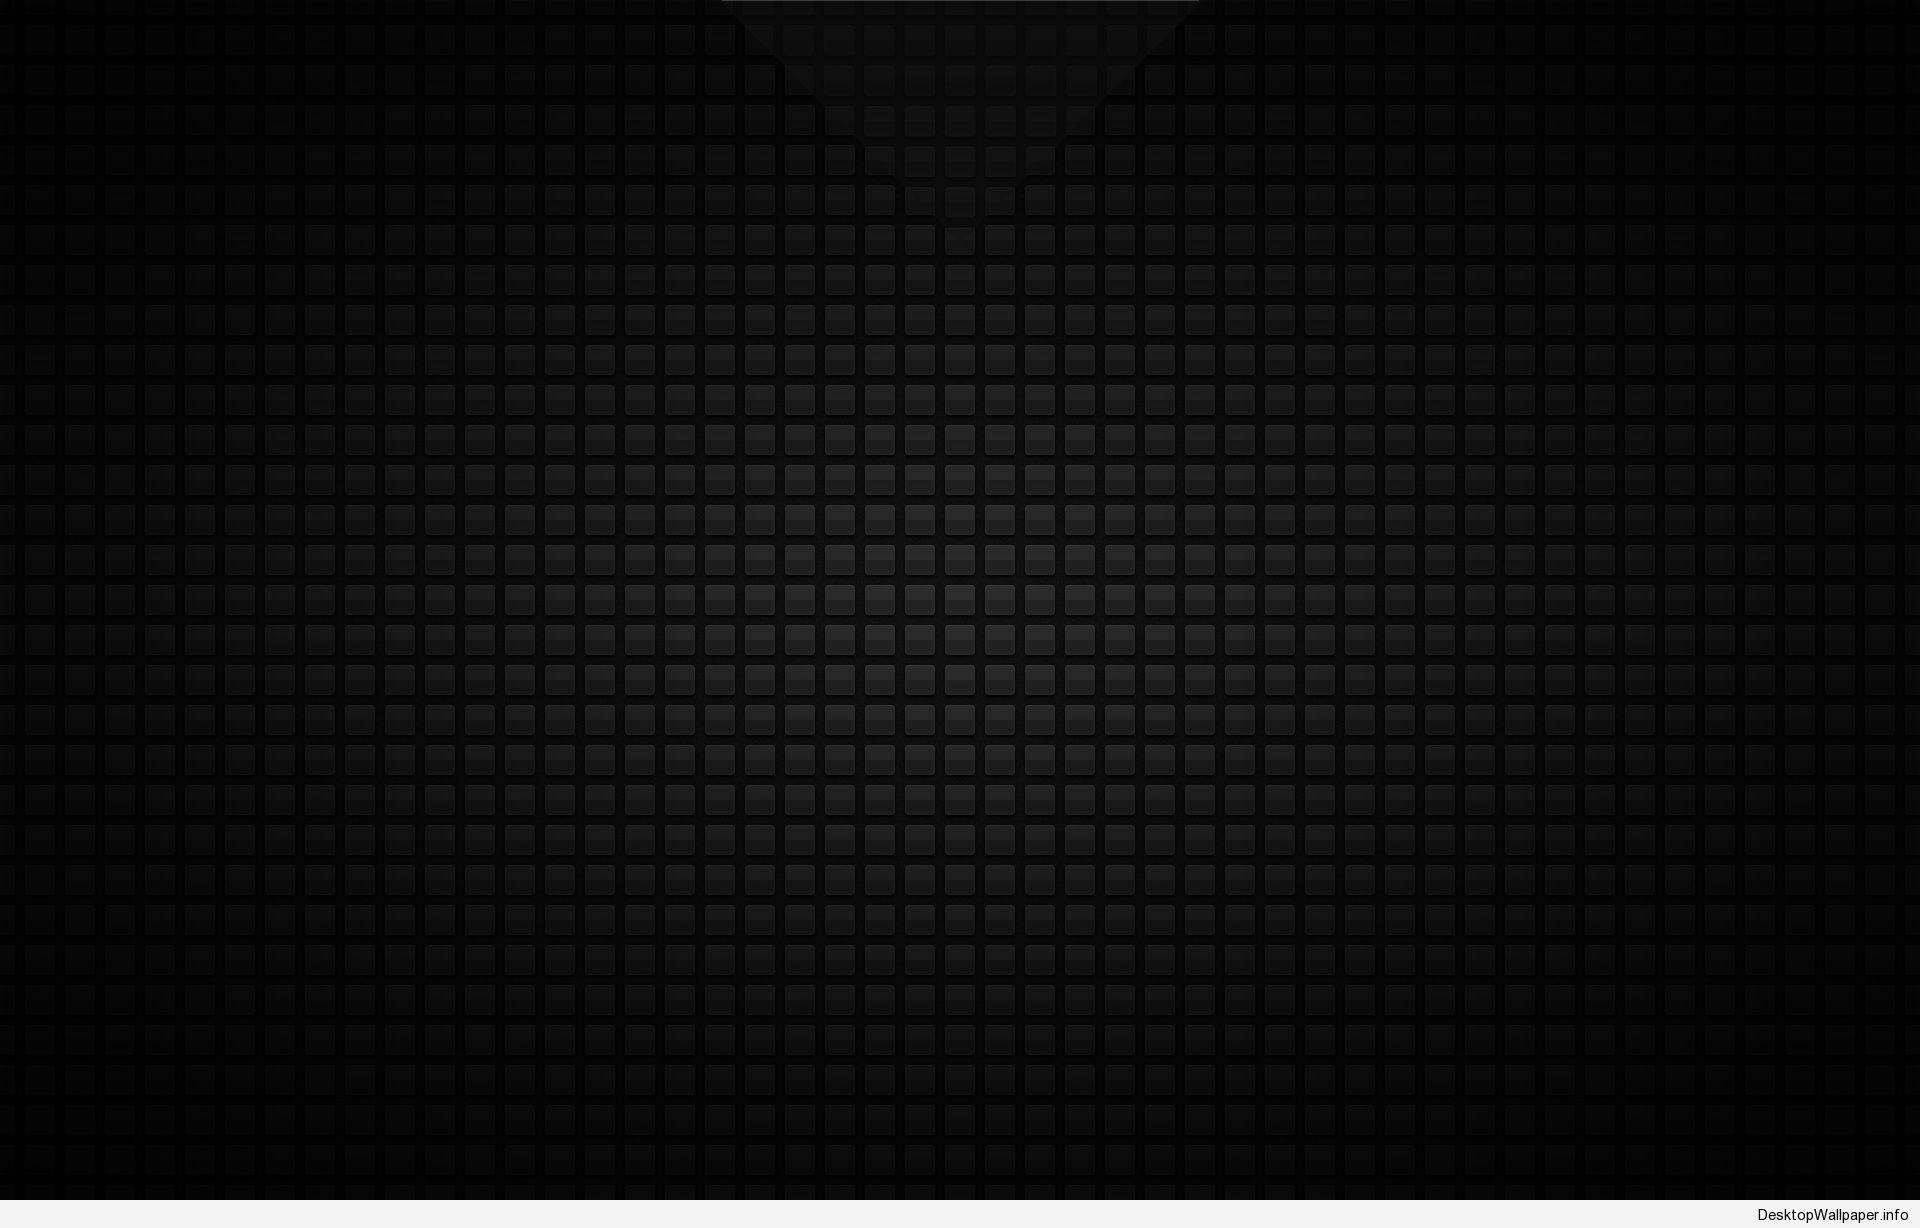 Unduh 88 Wallpaper Hp Hitam Polos Gambar HD Terbaru